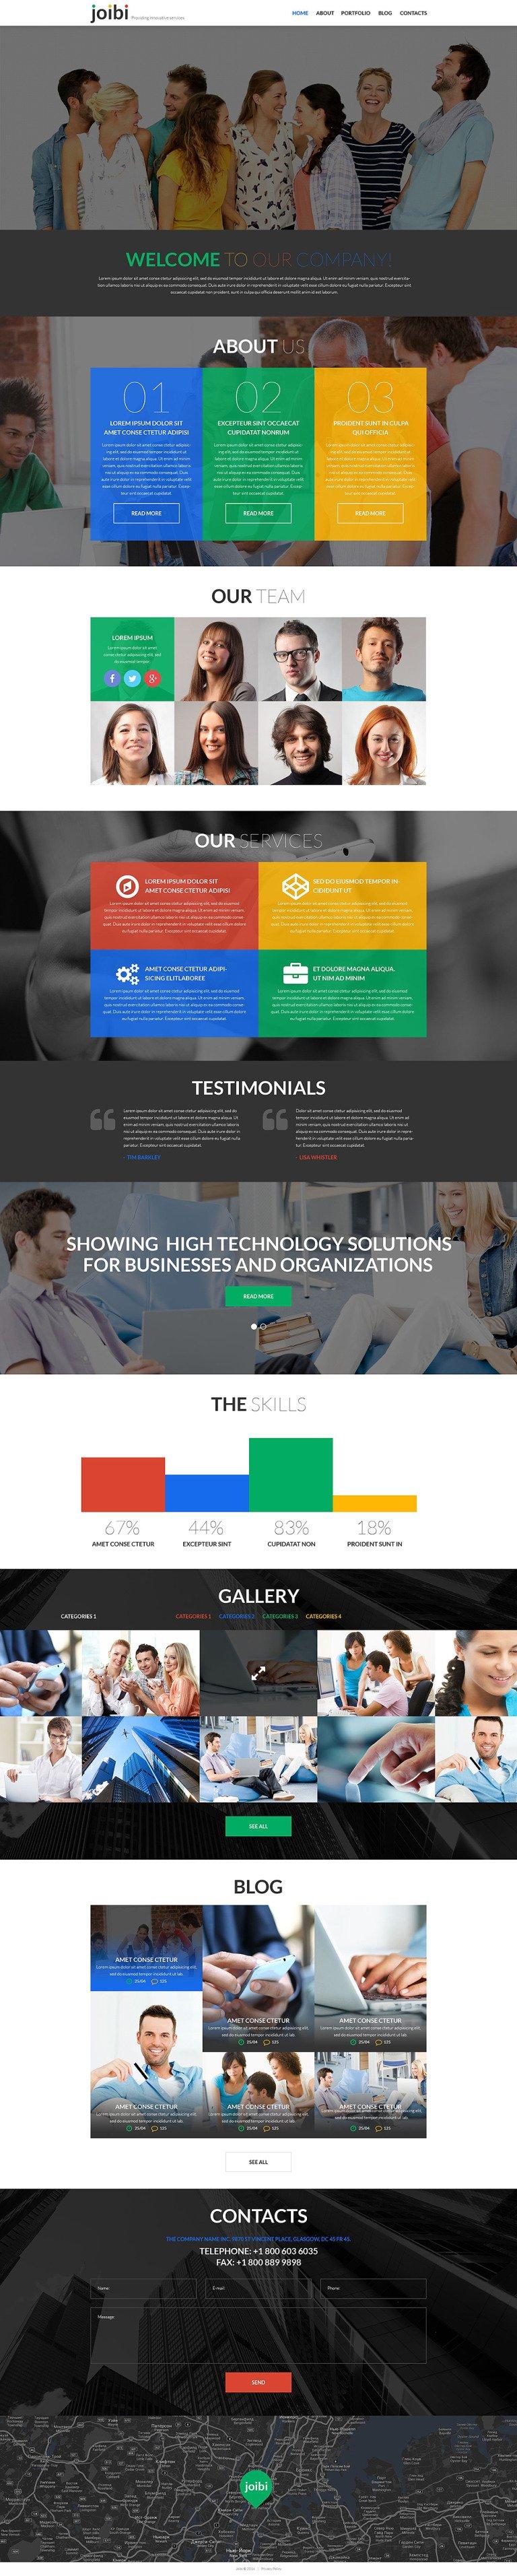 Business Services Promotion WordPress Theme New Screenshots BIG